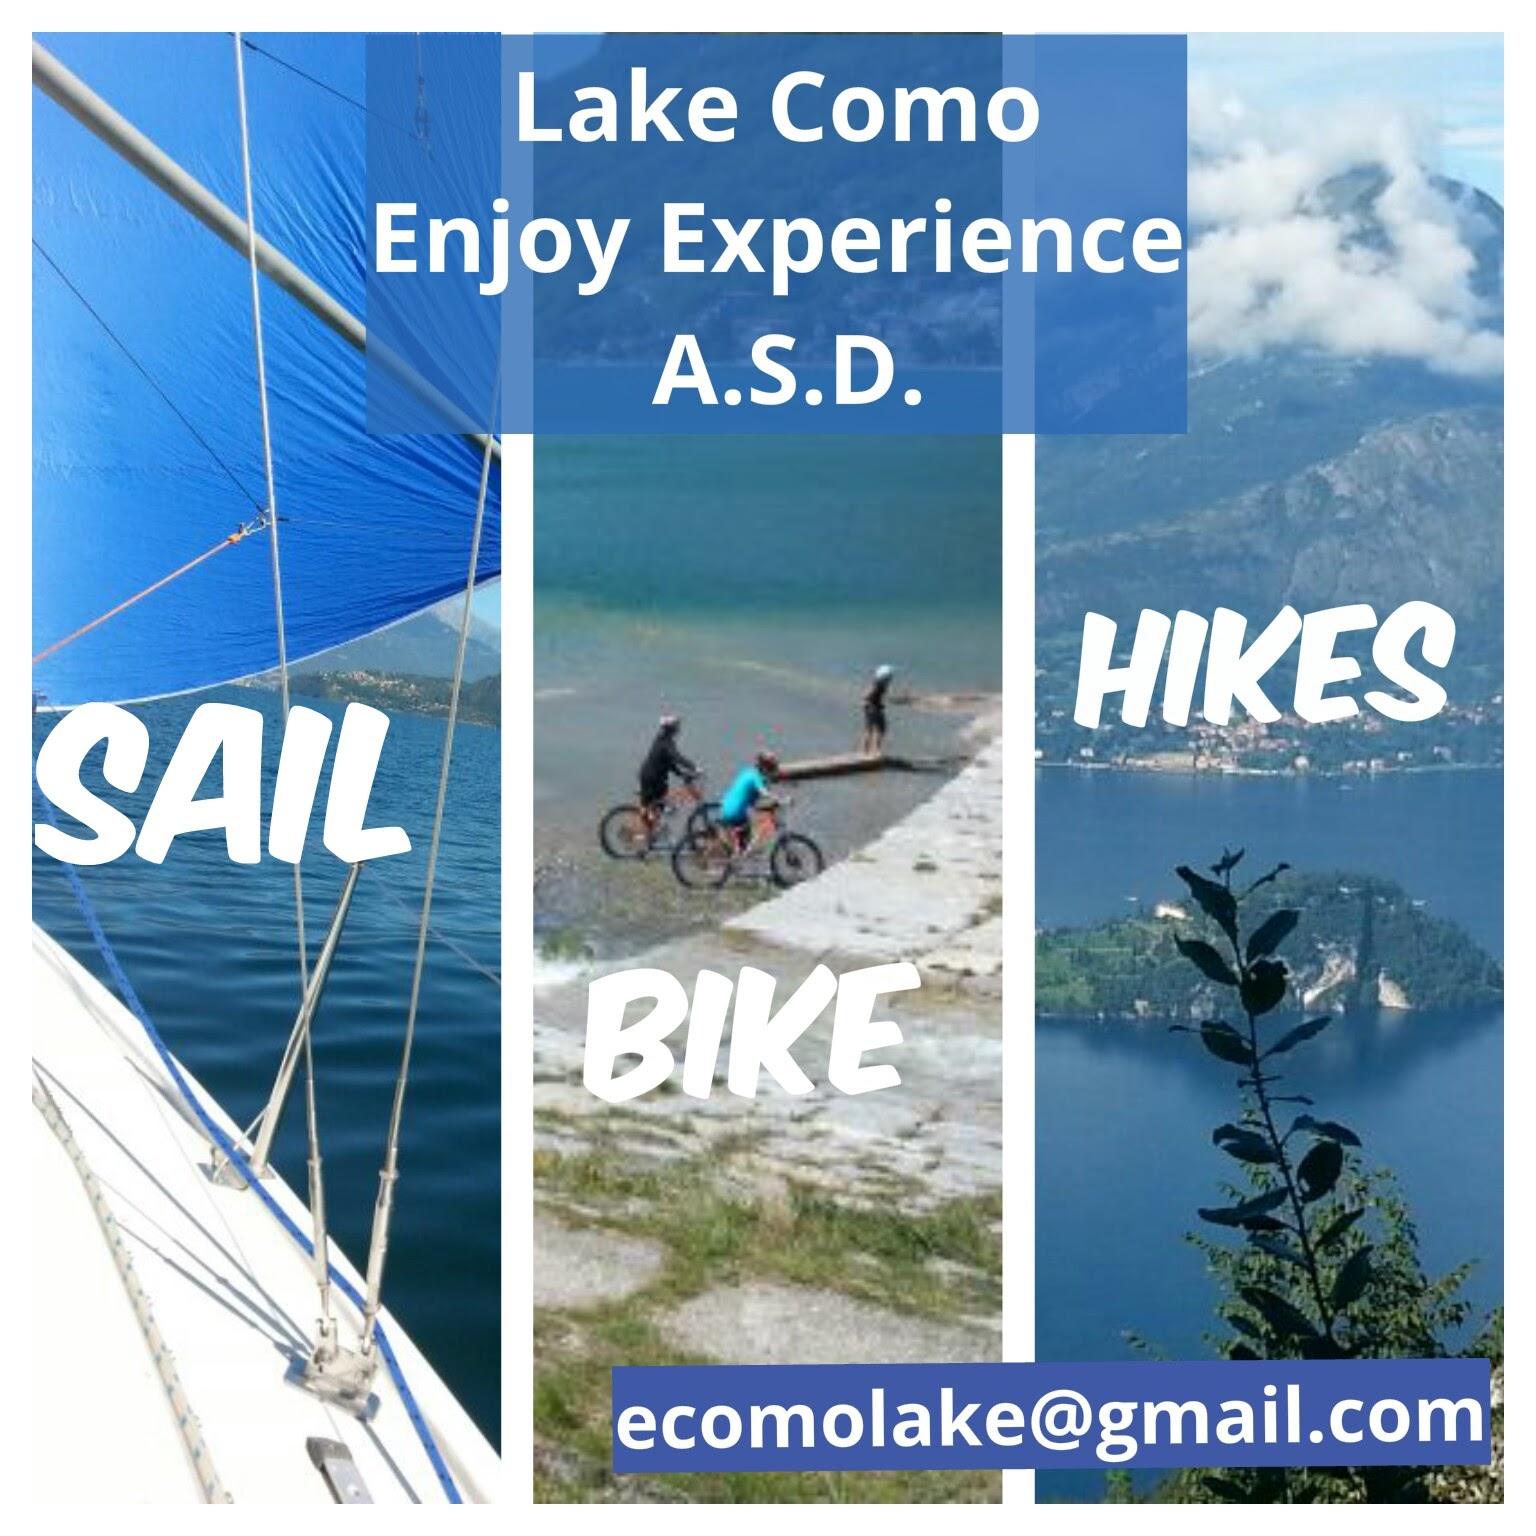 Associazione Lake Como Enjoy Experience